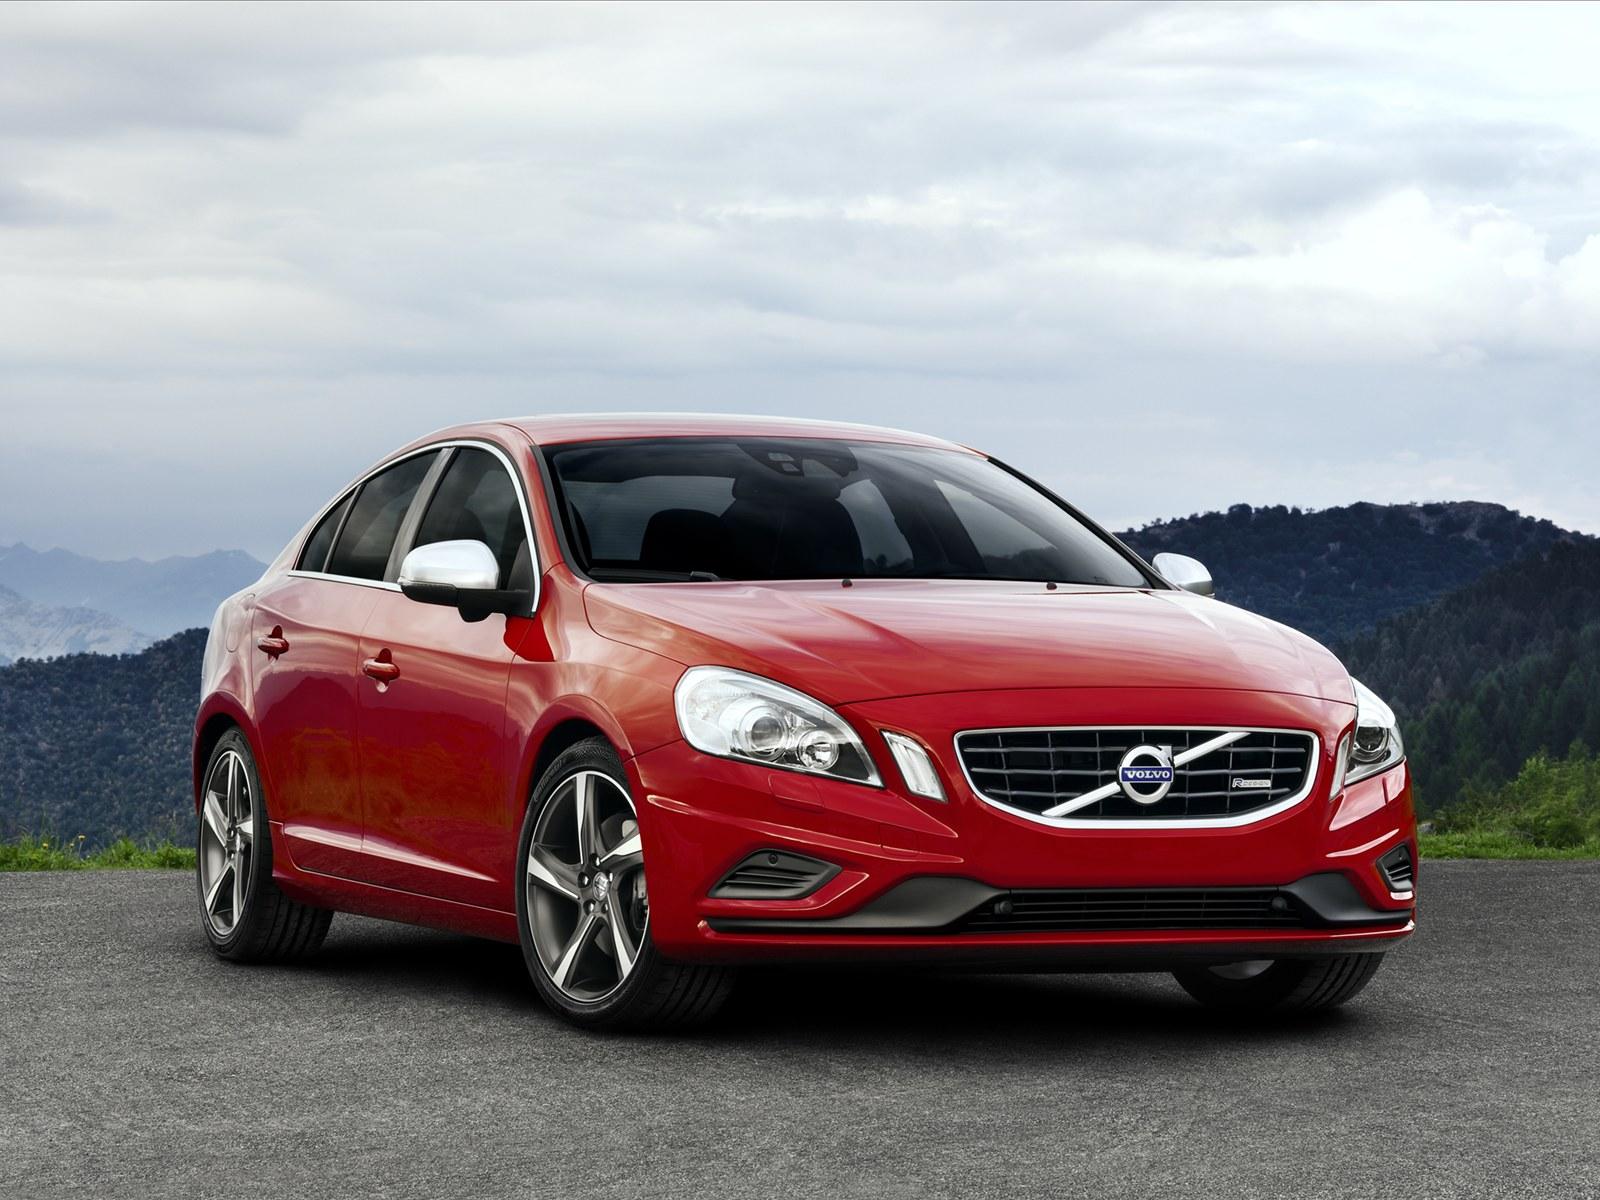 auto cars new 2011 - photo #4